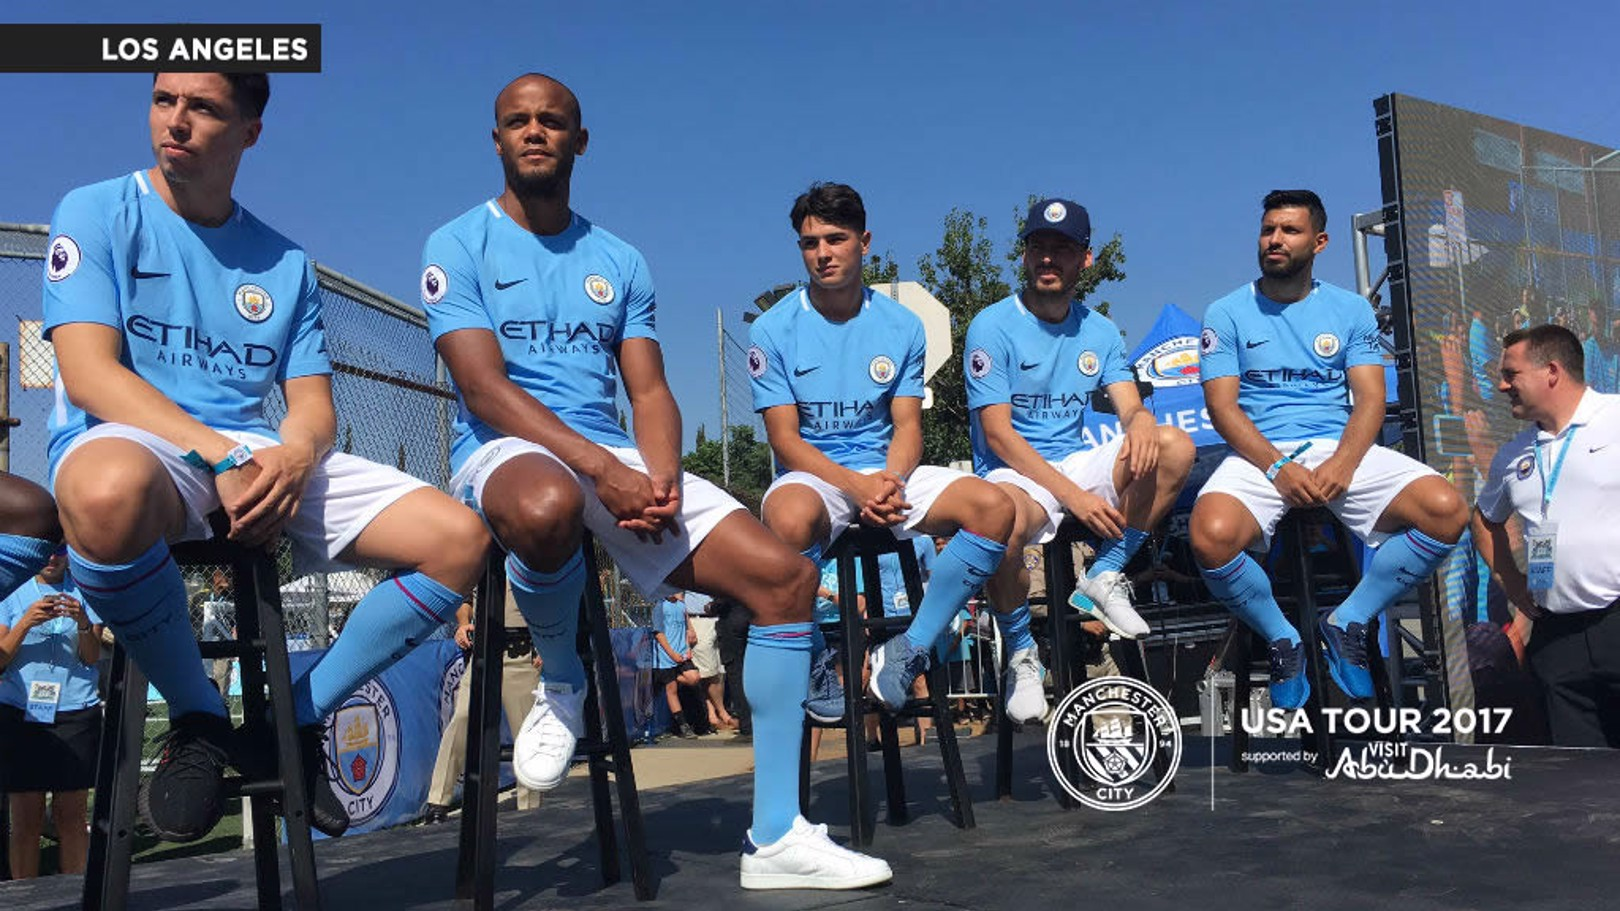 BLUE SKY THINKING: Samir Nasri, Vincent Kompany, Brahim Diaz, David Silva and Sergio Aguero at the Soccer Festival in east LA